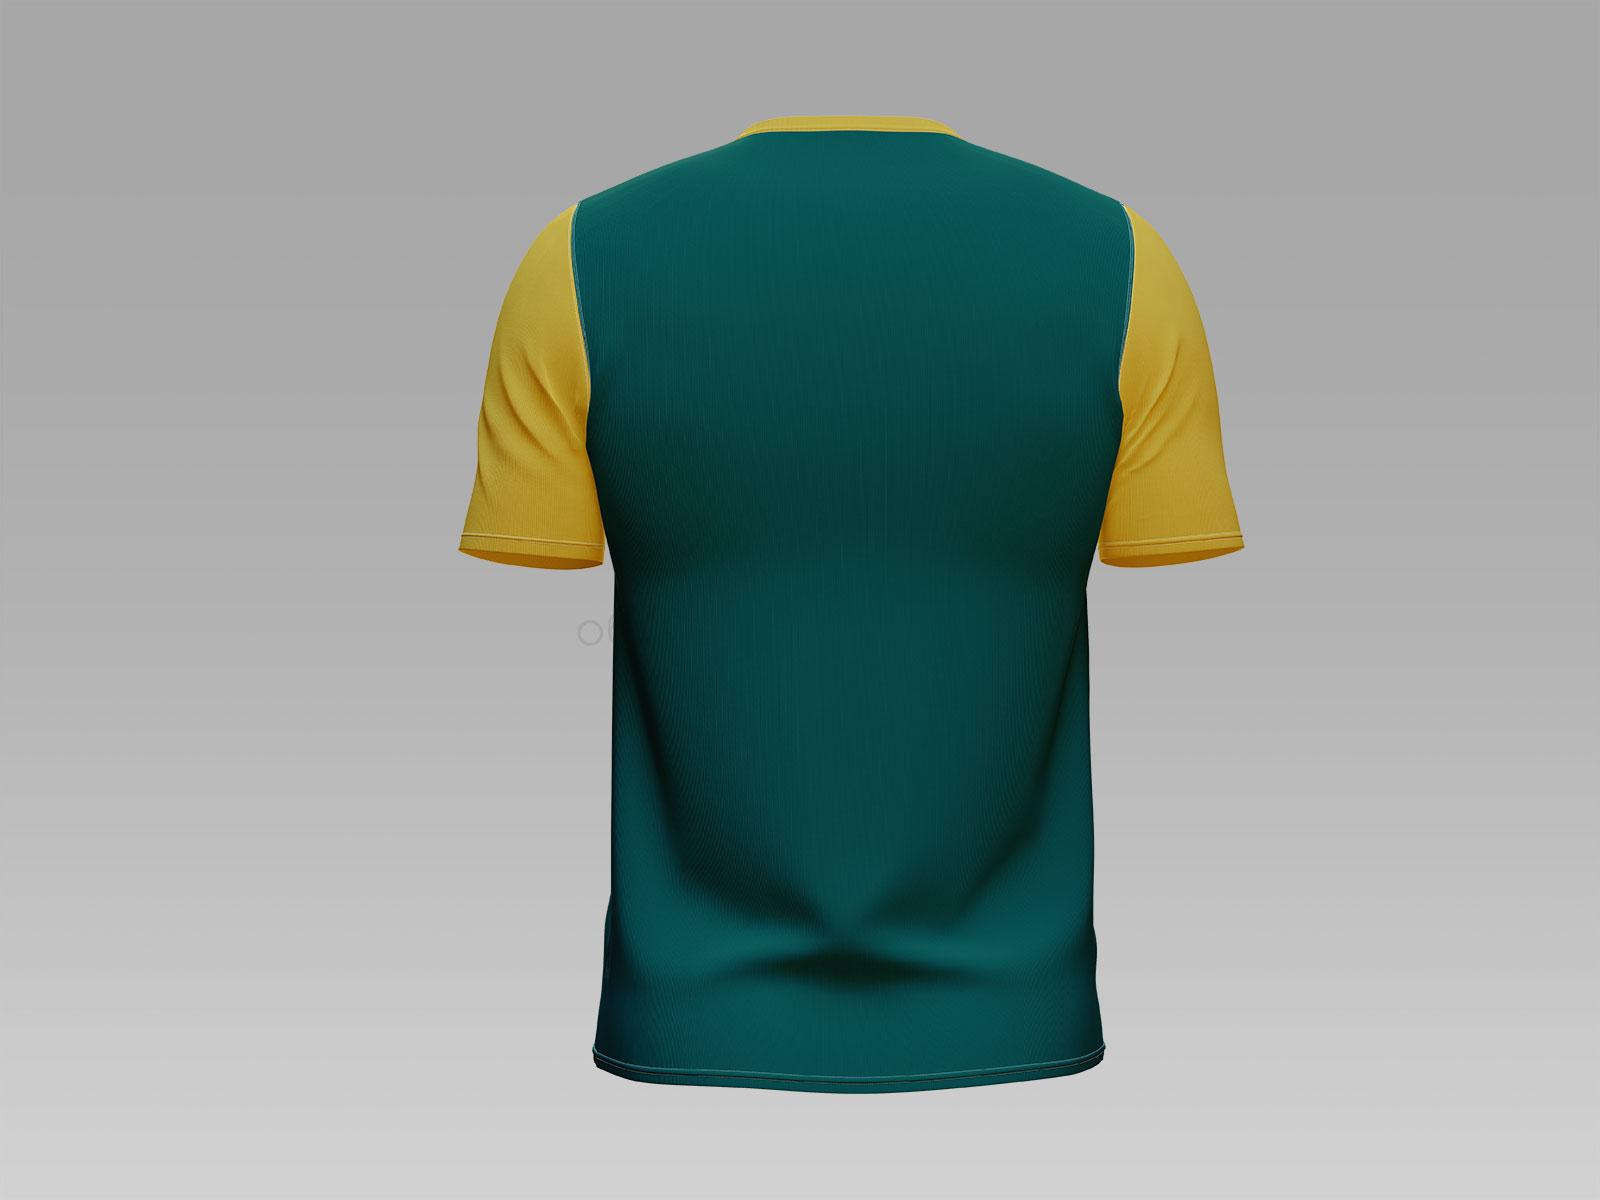 Free Henley Collarless Pullover T-Shirt Mockup PSD Set